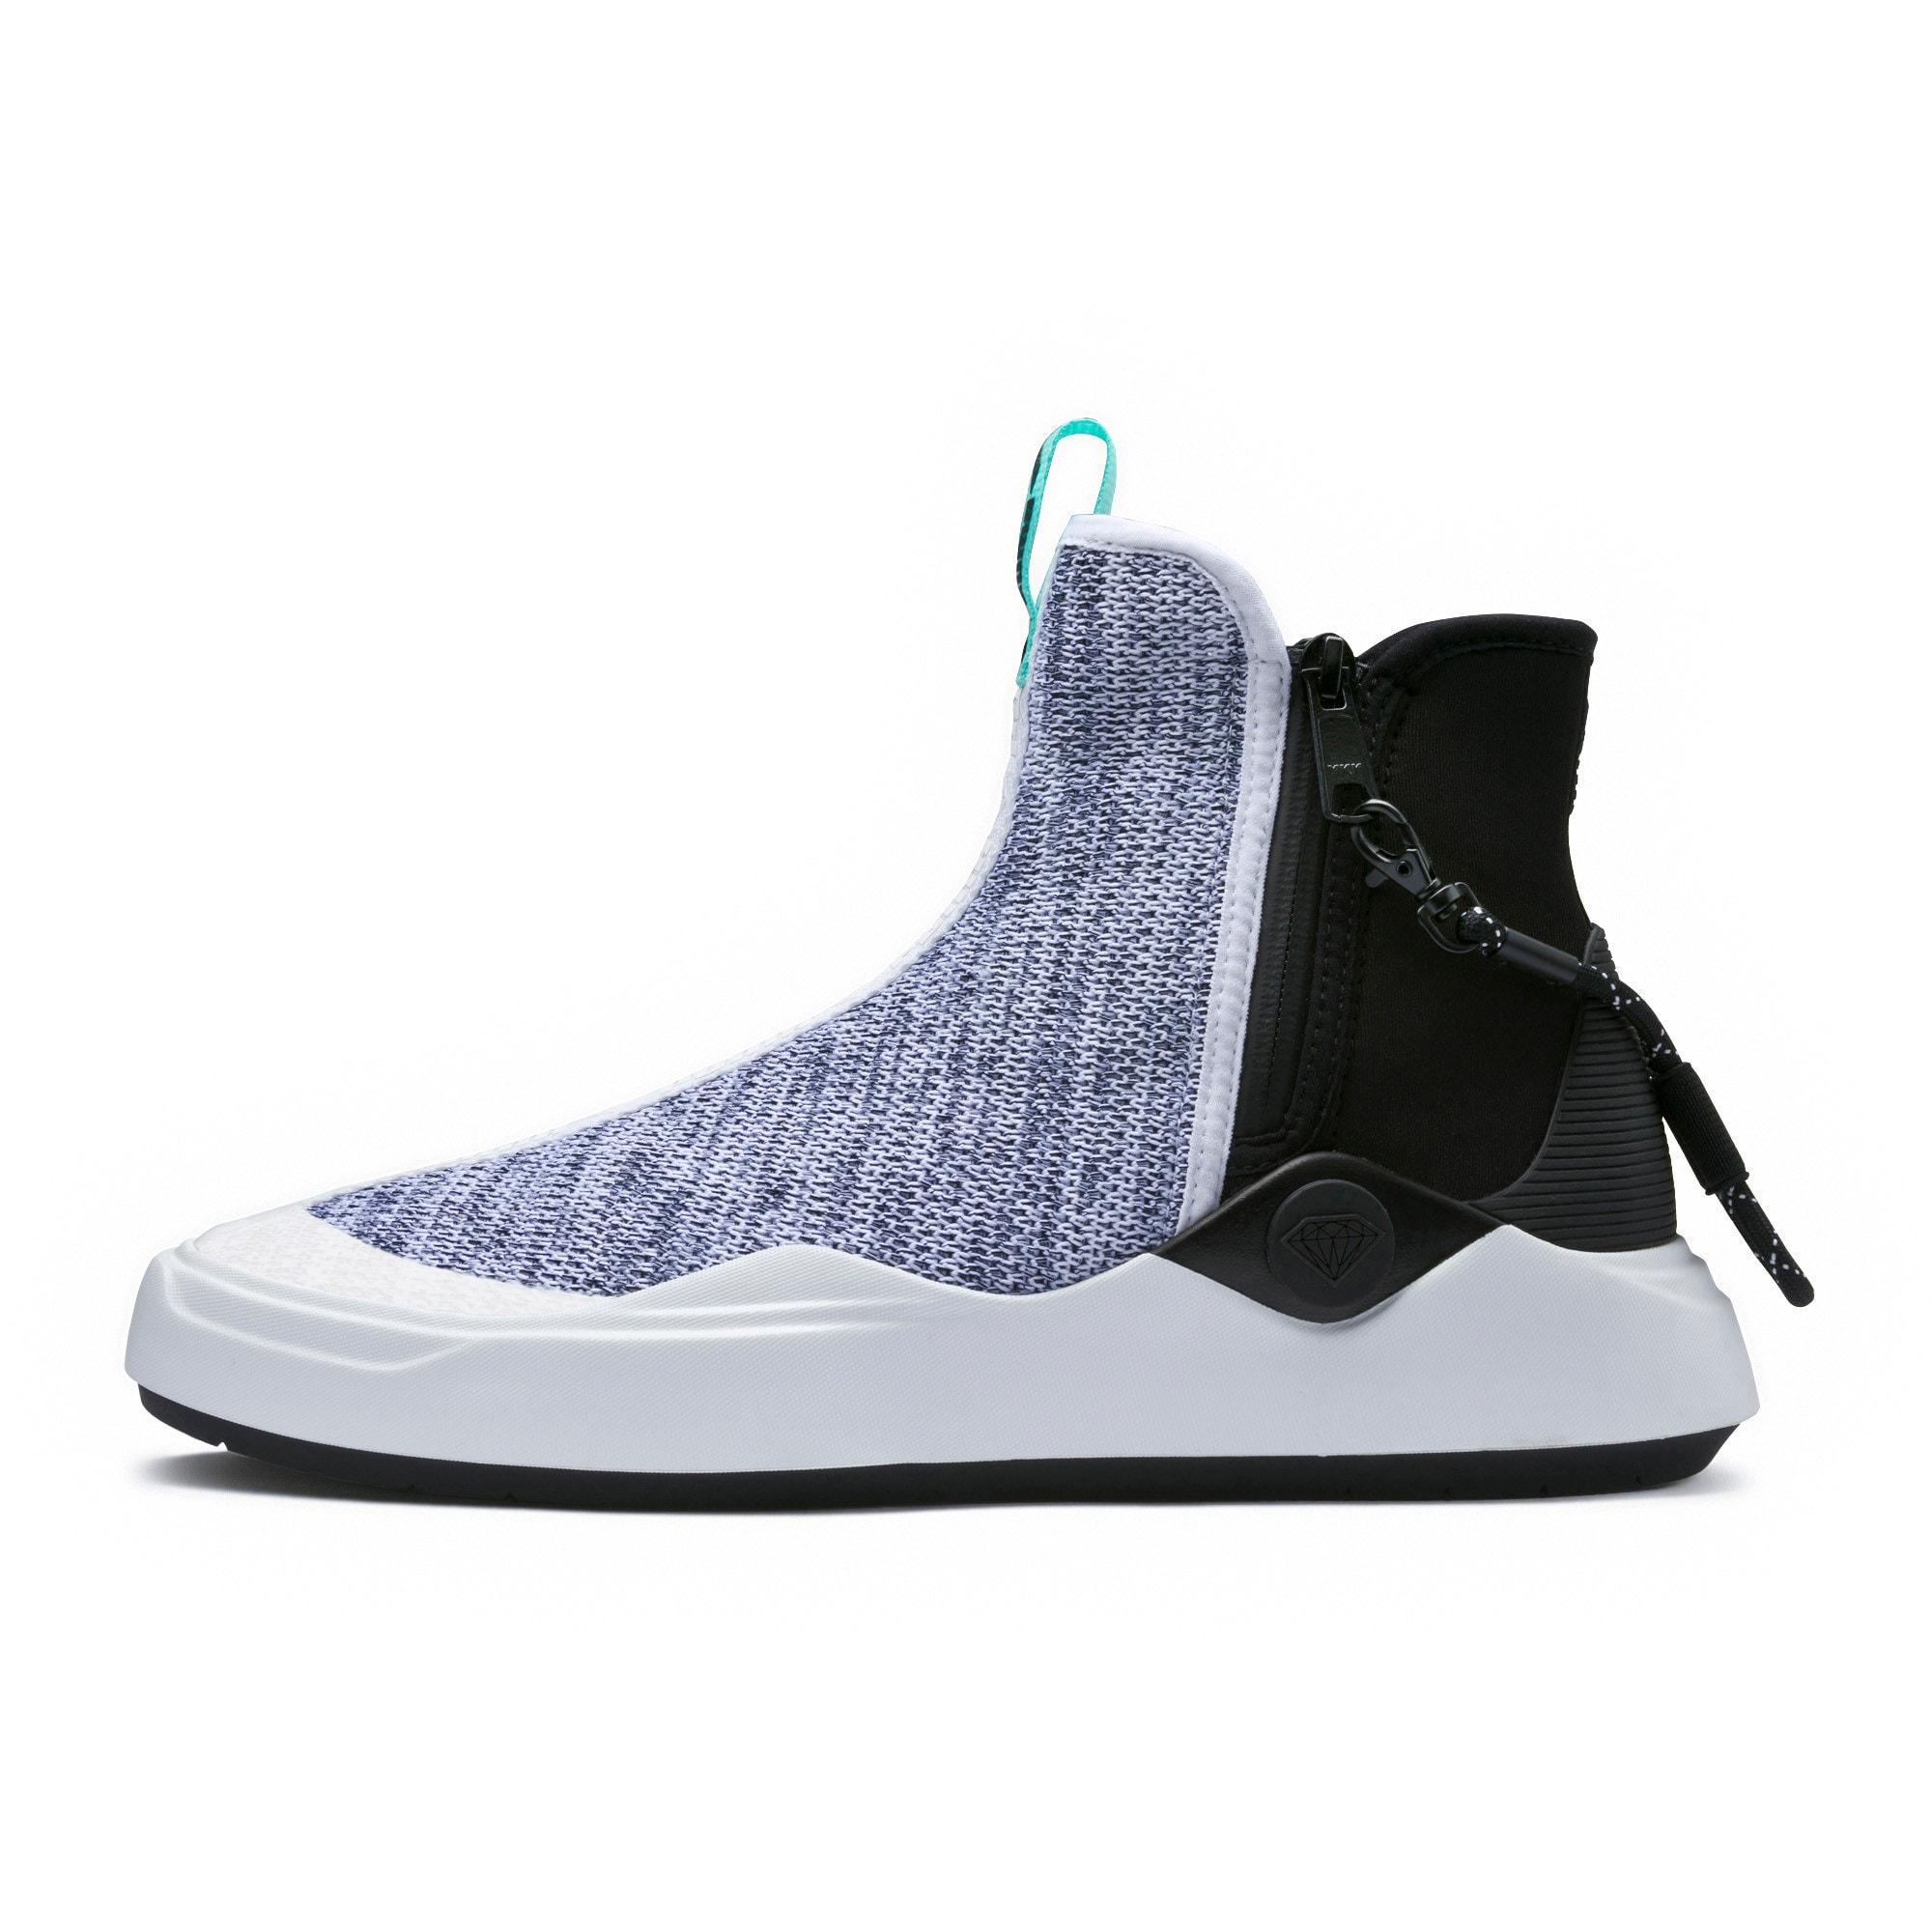 Thumbnail 1 of PUMA x DIAMOND Abyss Knit Sneakers, Puma White-Puma Black, medium